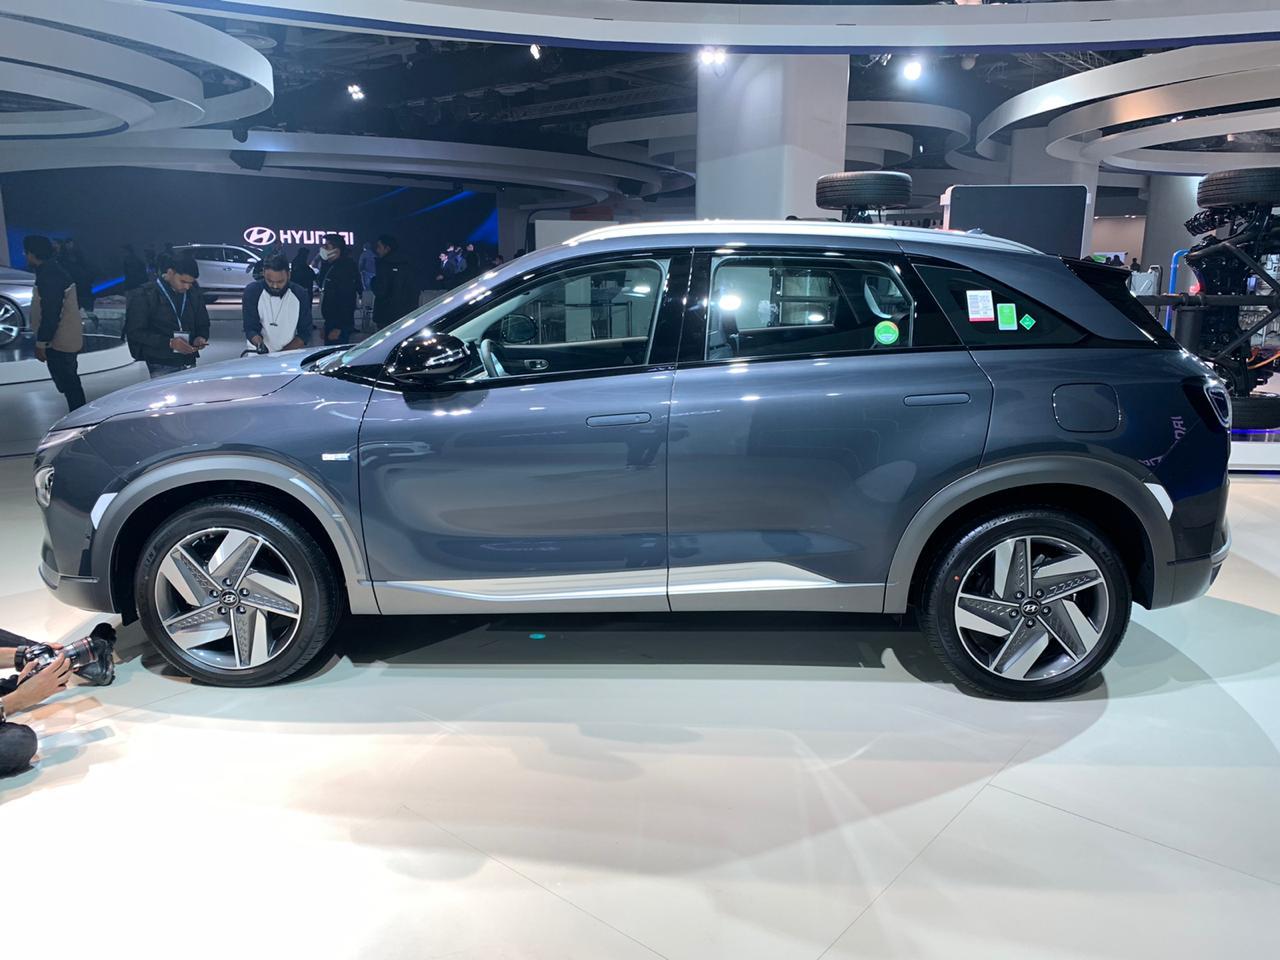 Hyundai Nexo side view - Auto Expo 2020